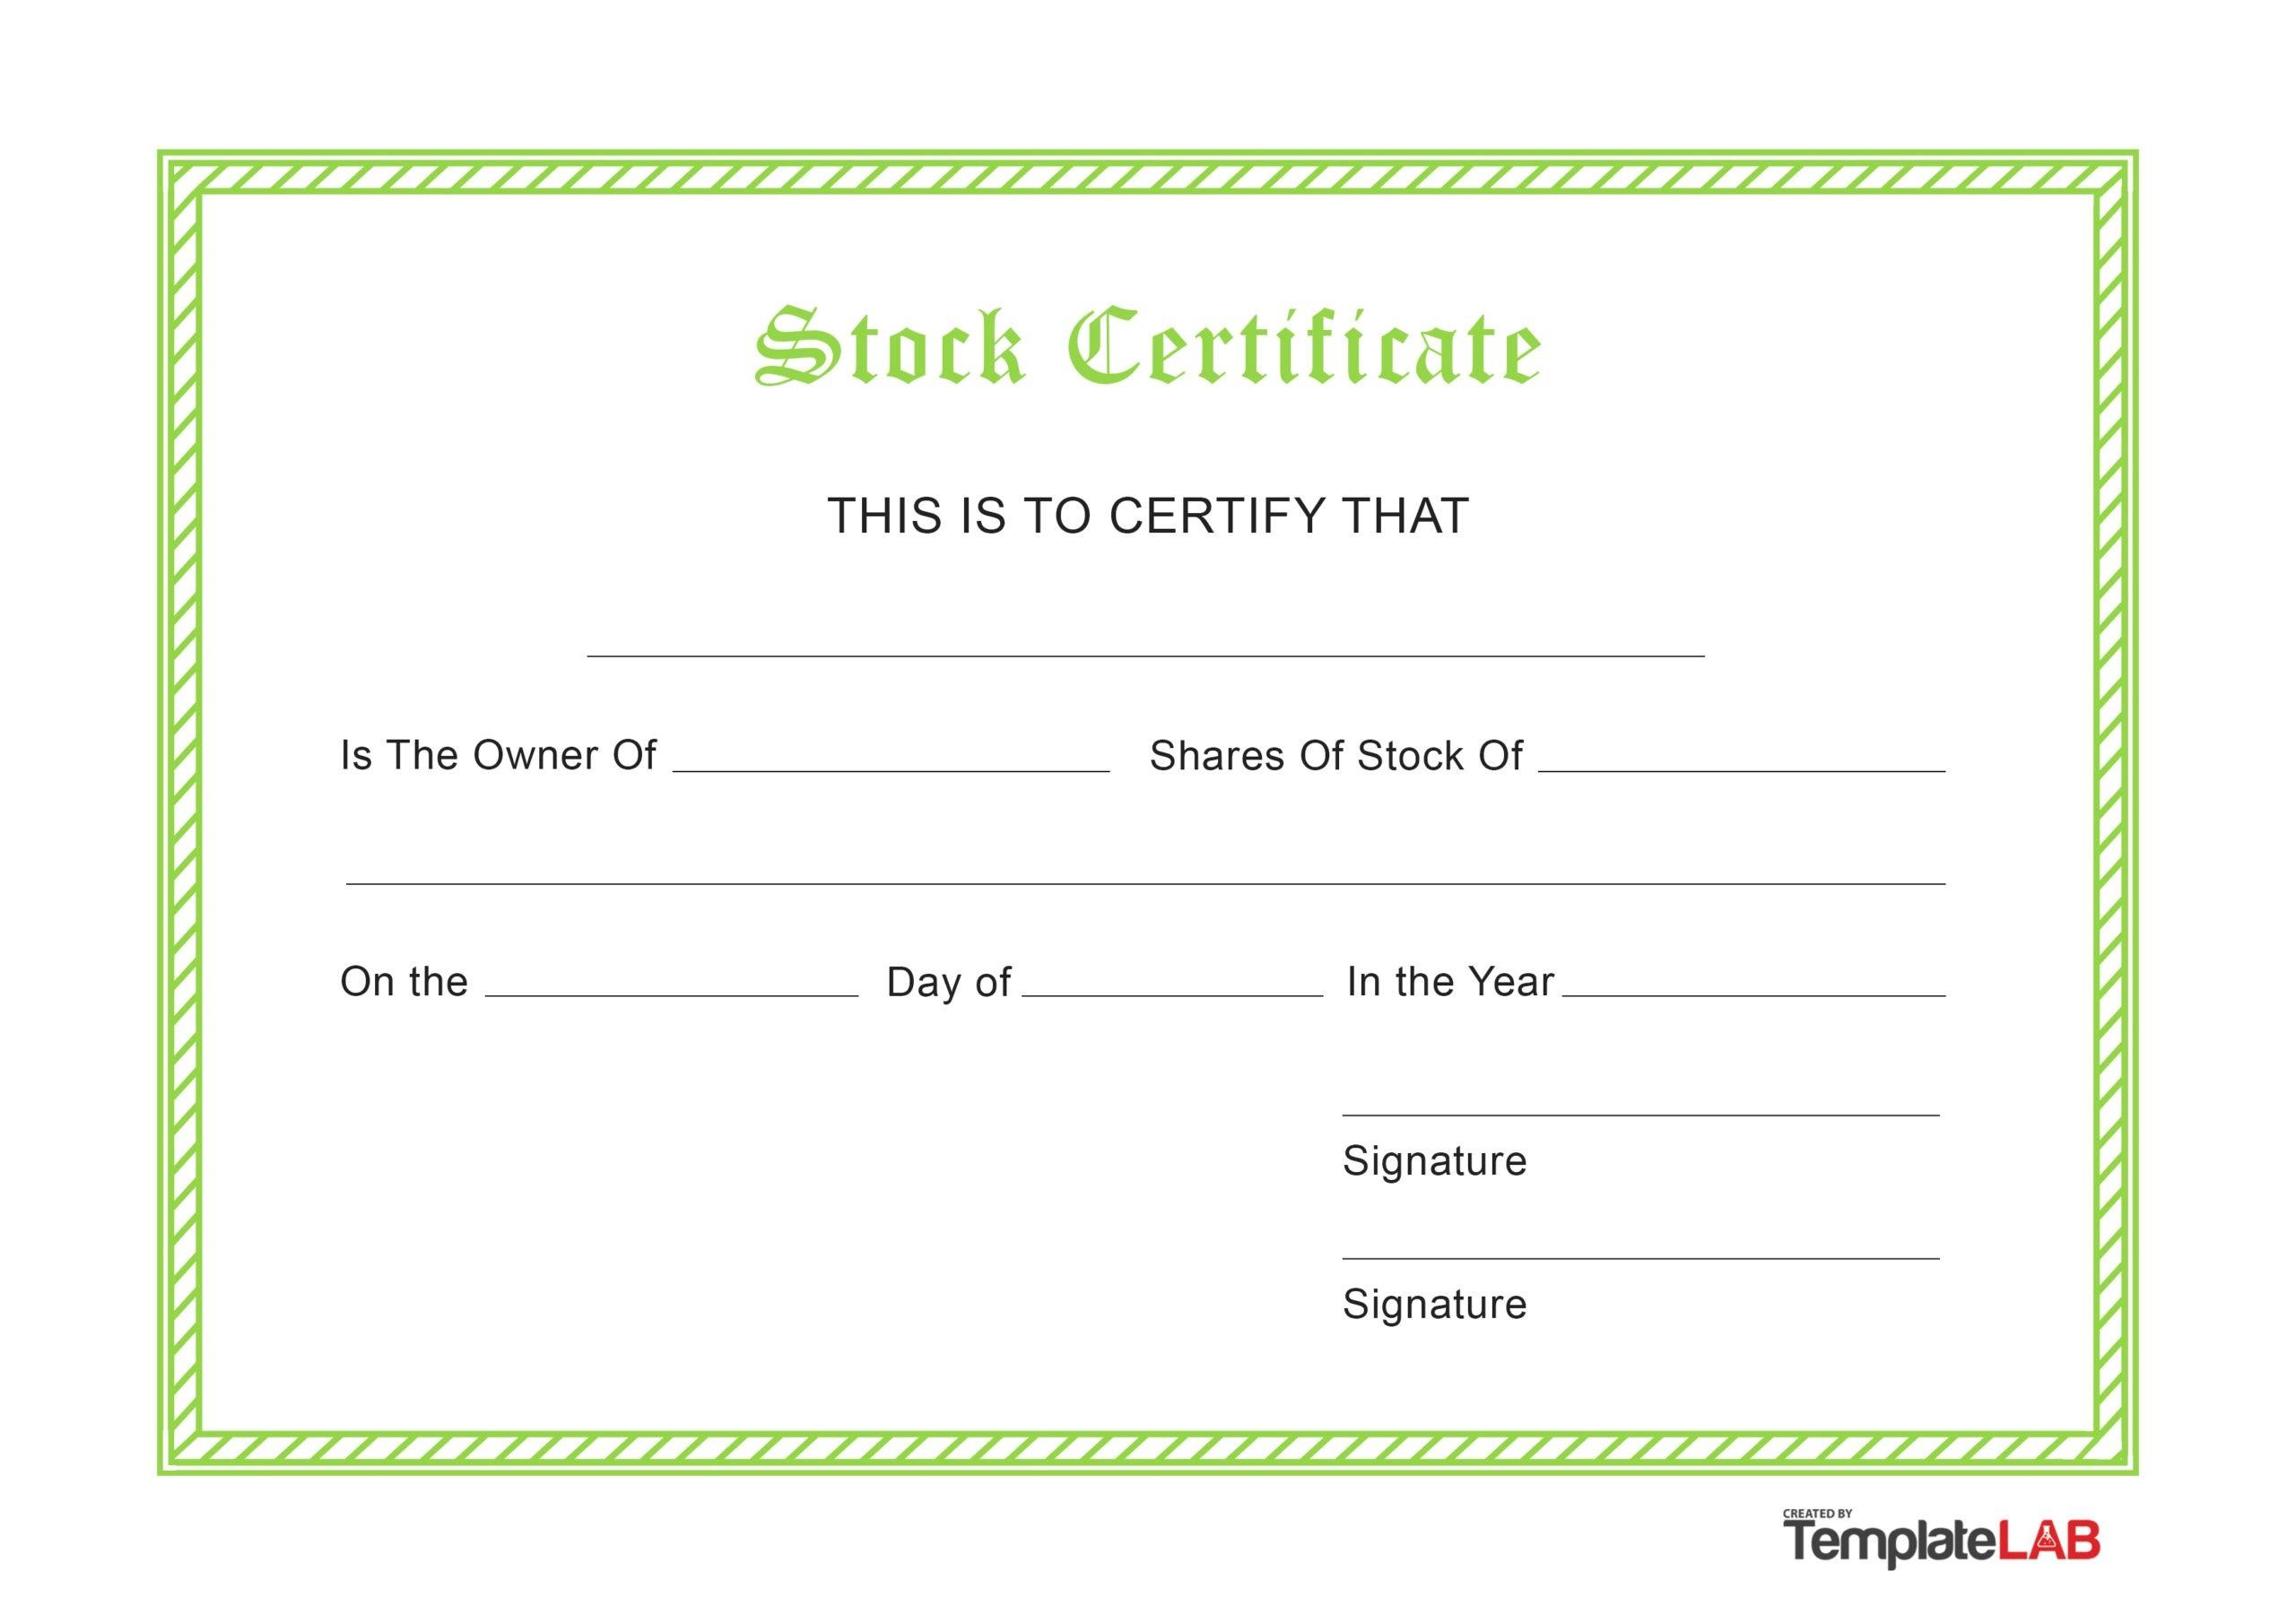 Free Stock Certificate v1